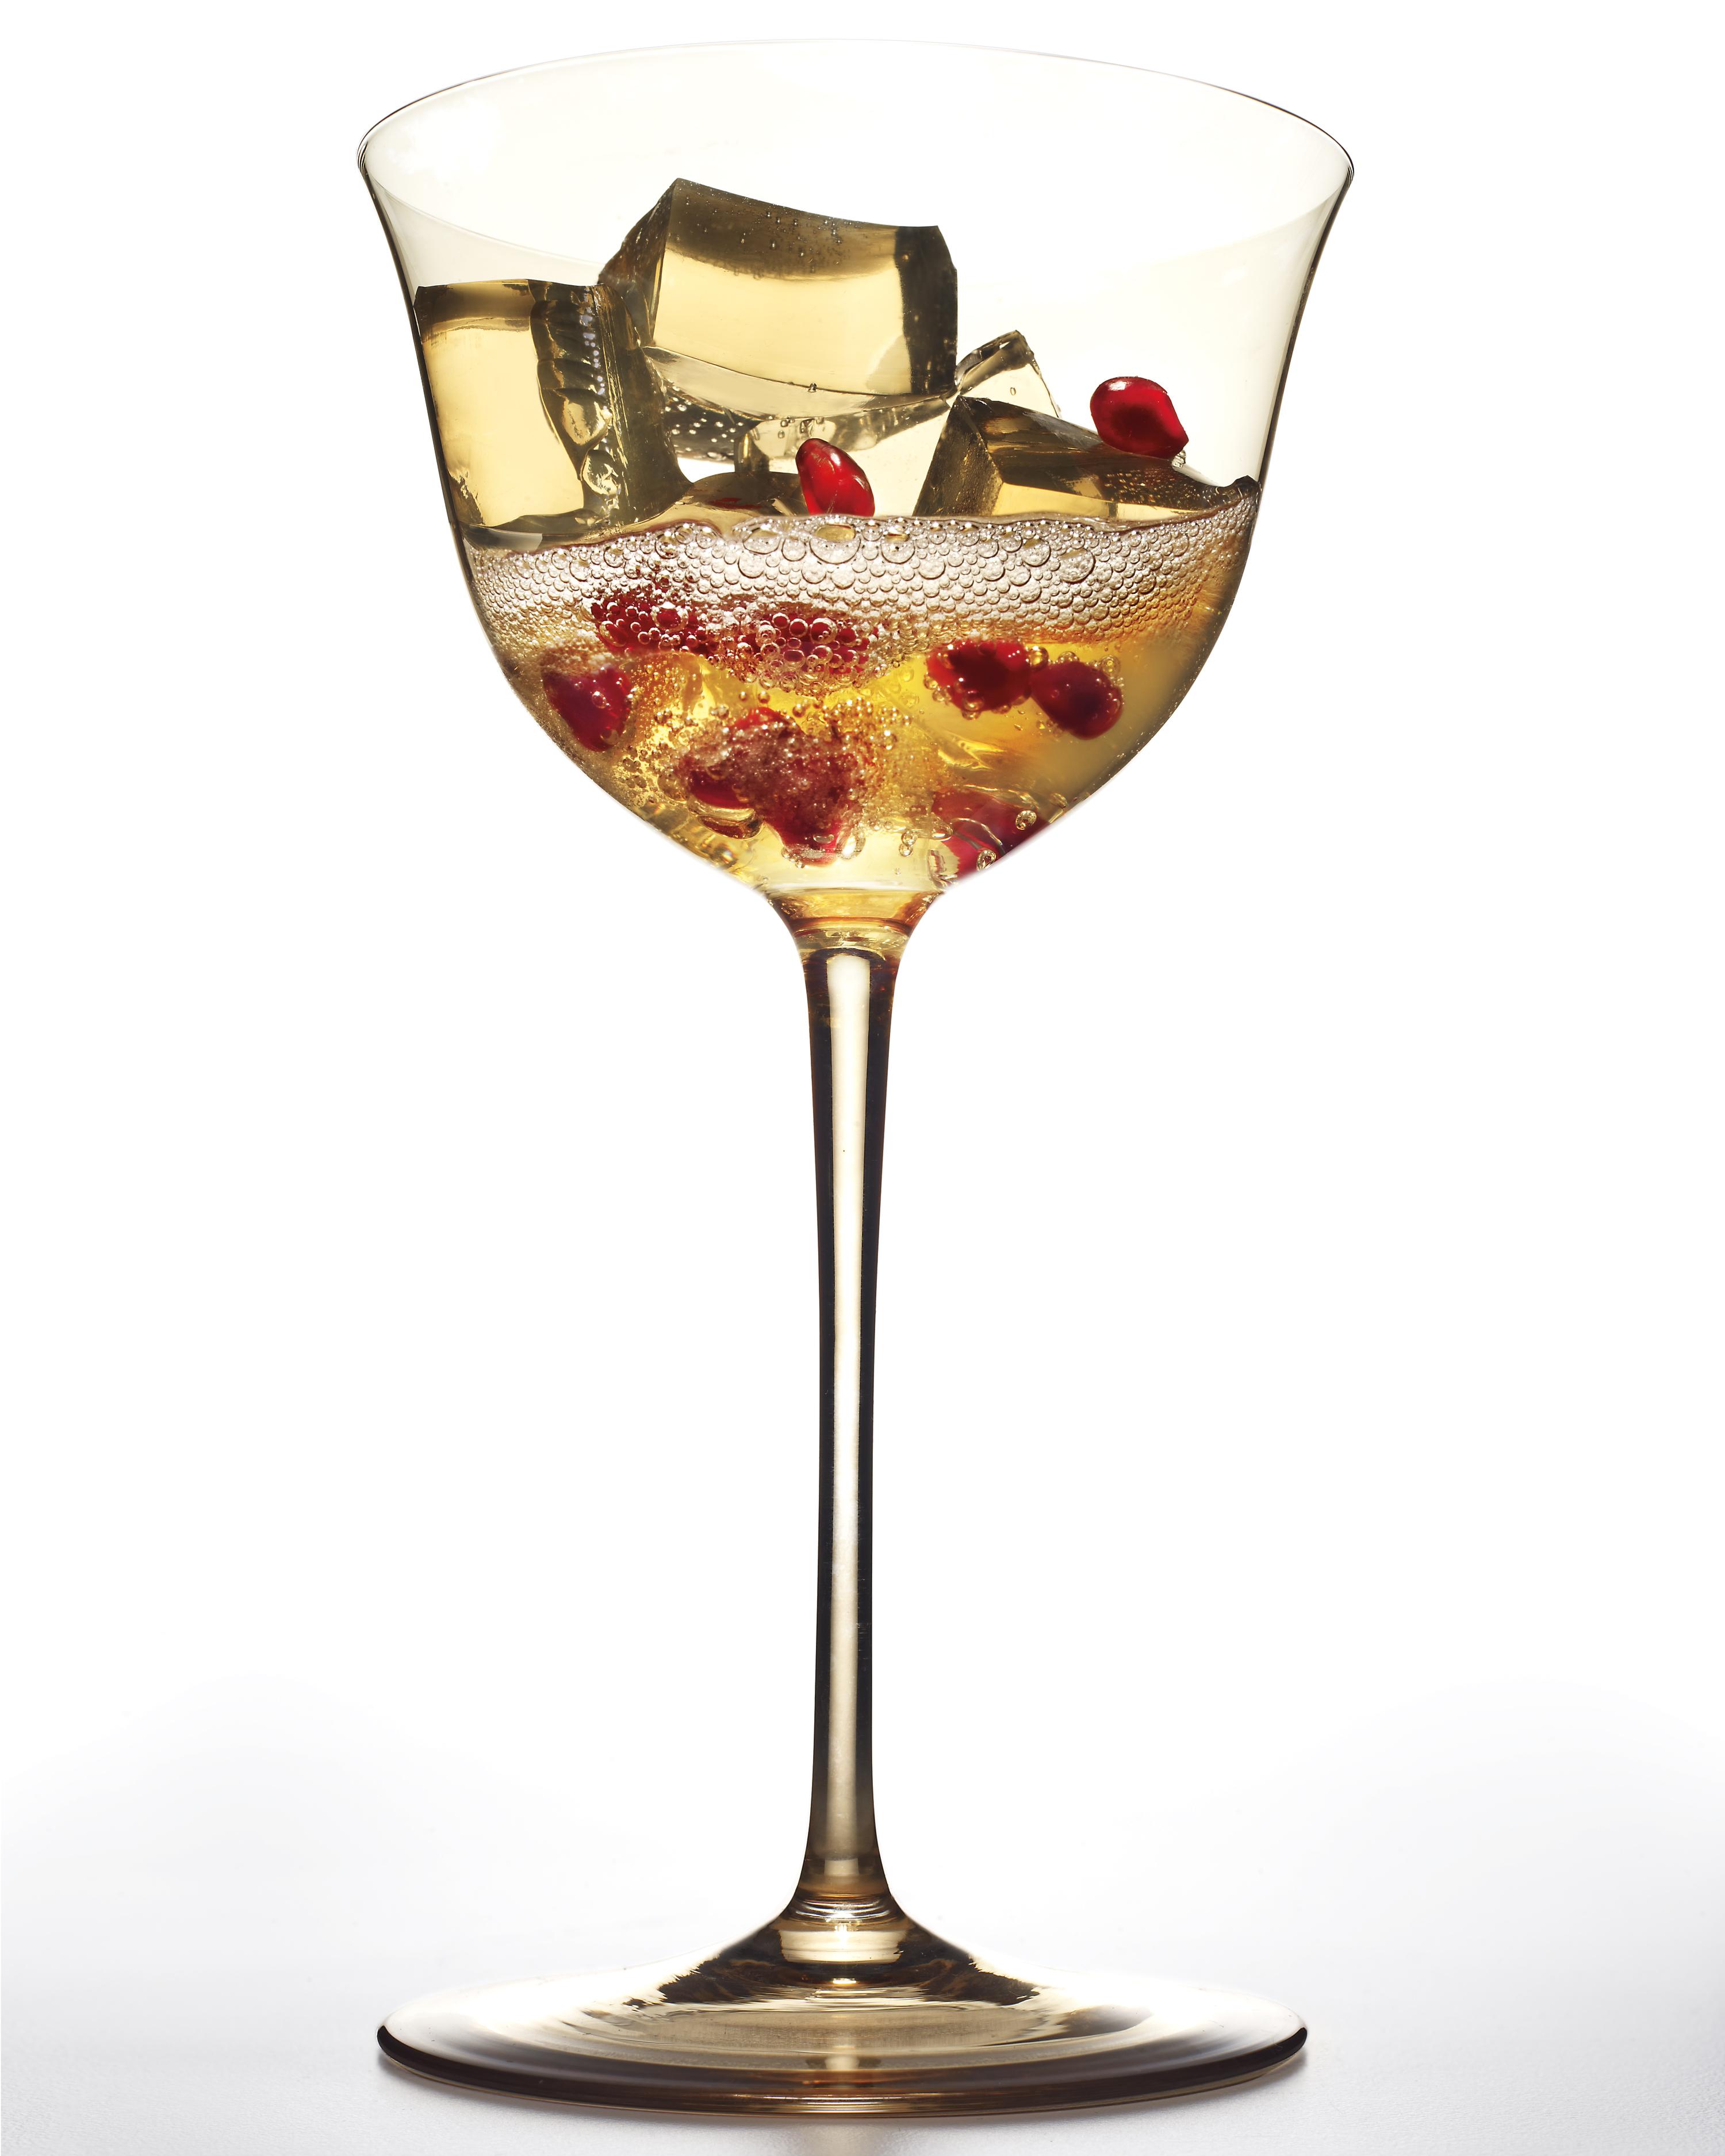 champagne-gelee-0077-md110526.jpg